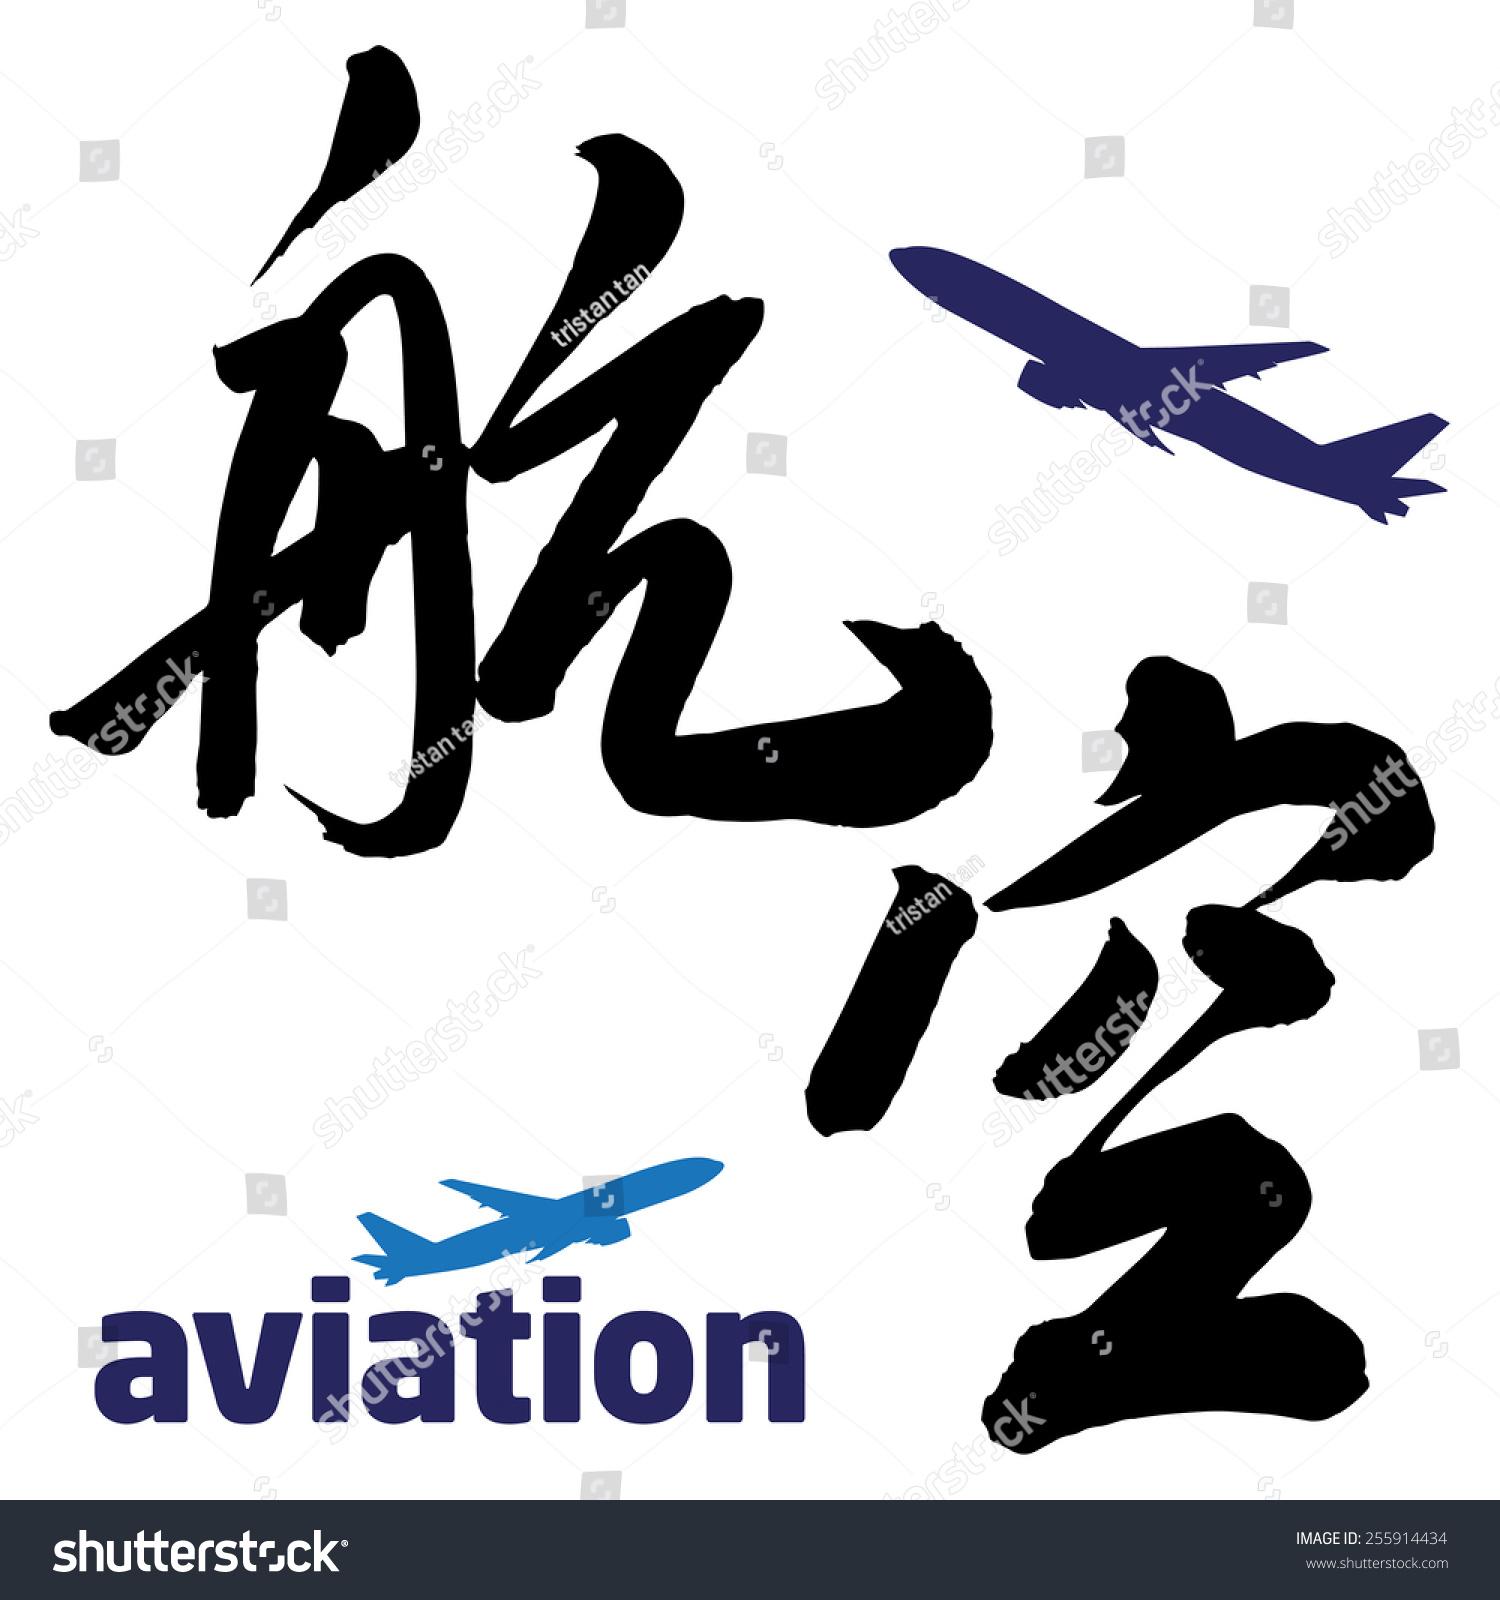 Chinese Calligraphy Hang Kong Translation Aviation Stock